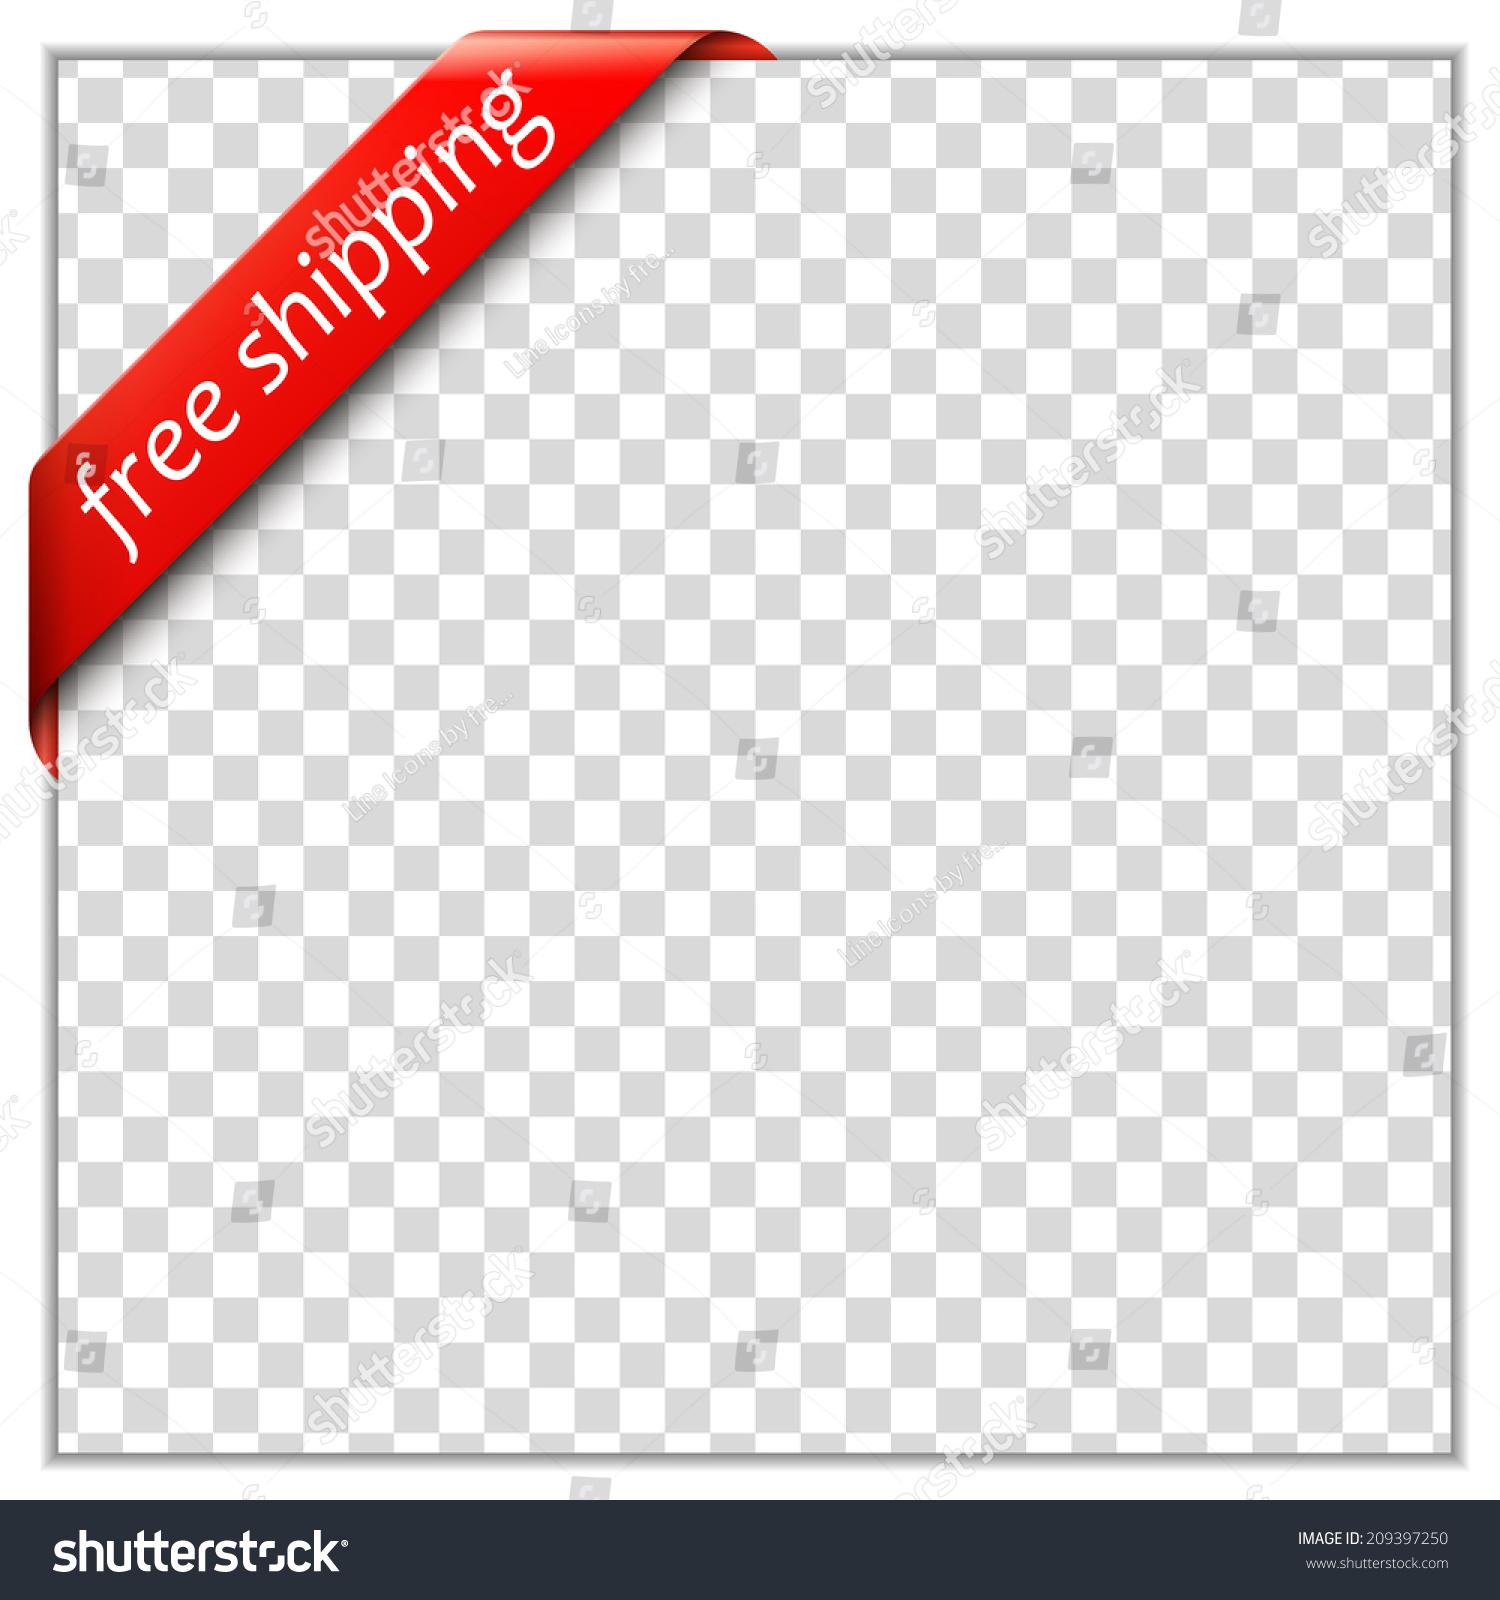 Free Shipping Corner Ribbon Corner Ribbon Vector 209397250 – Free White Paper Template